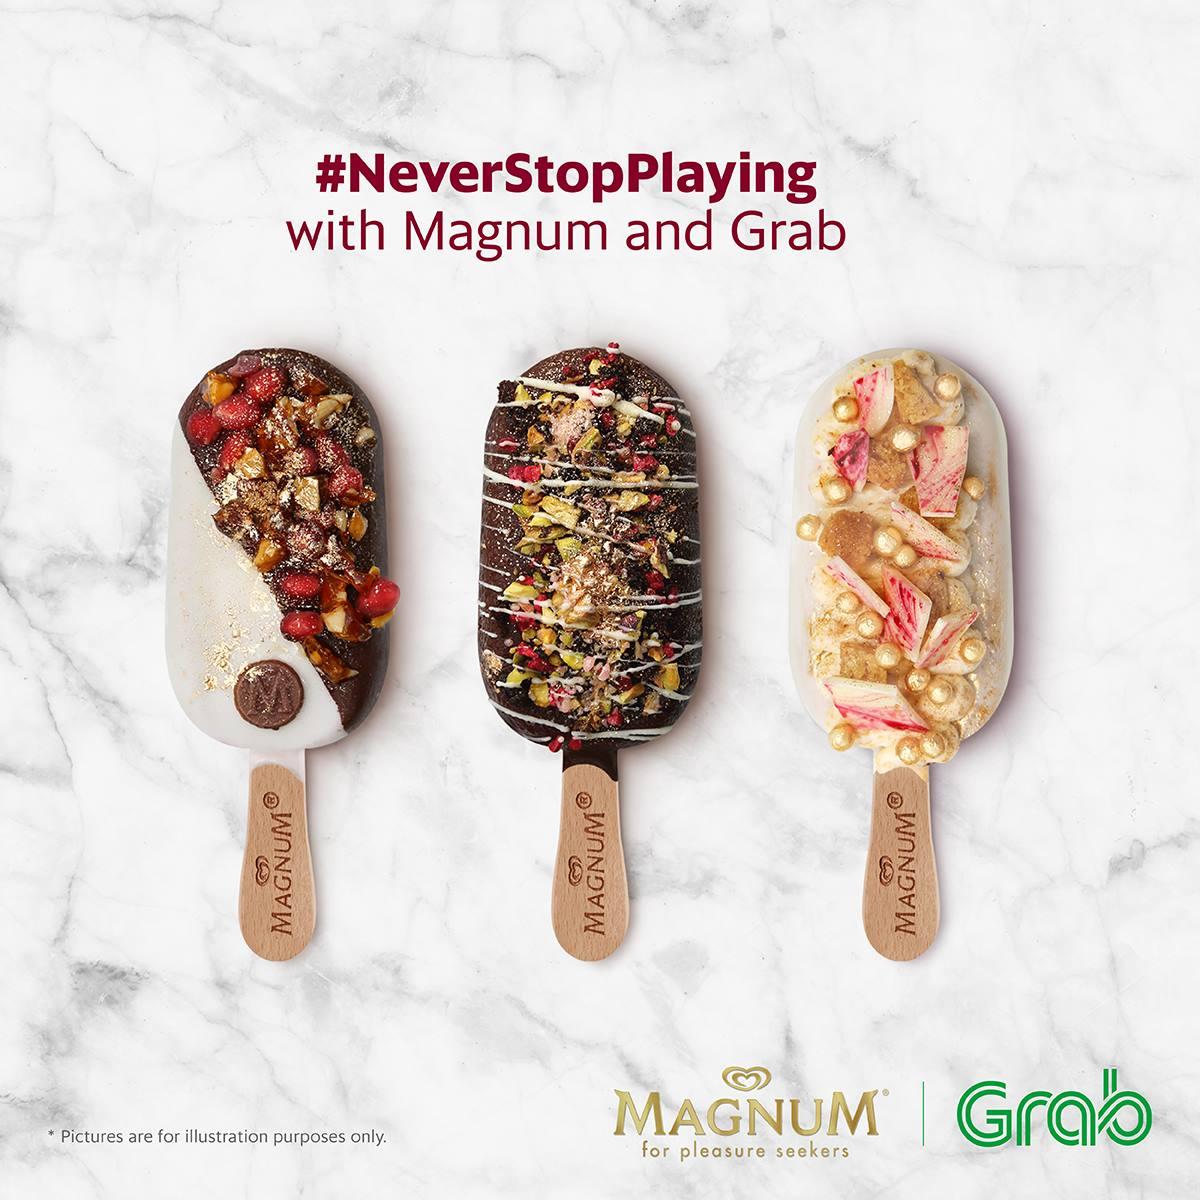 Grab 3 Magnum Red Velvet Ice Cream Rm30 Using Grabpay Klang Valley 10am 5pm Until 9 May 2017